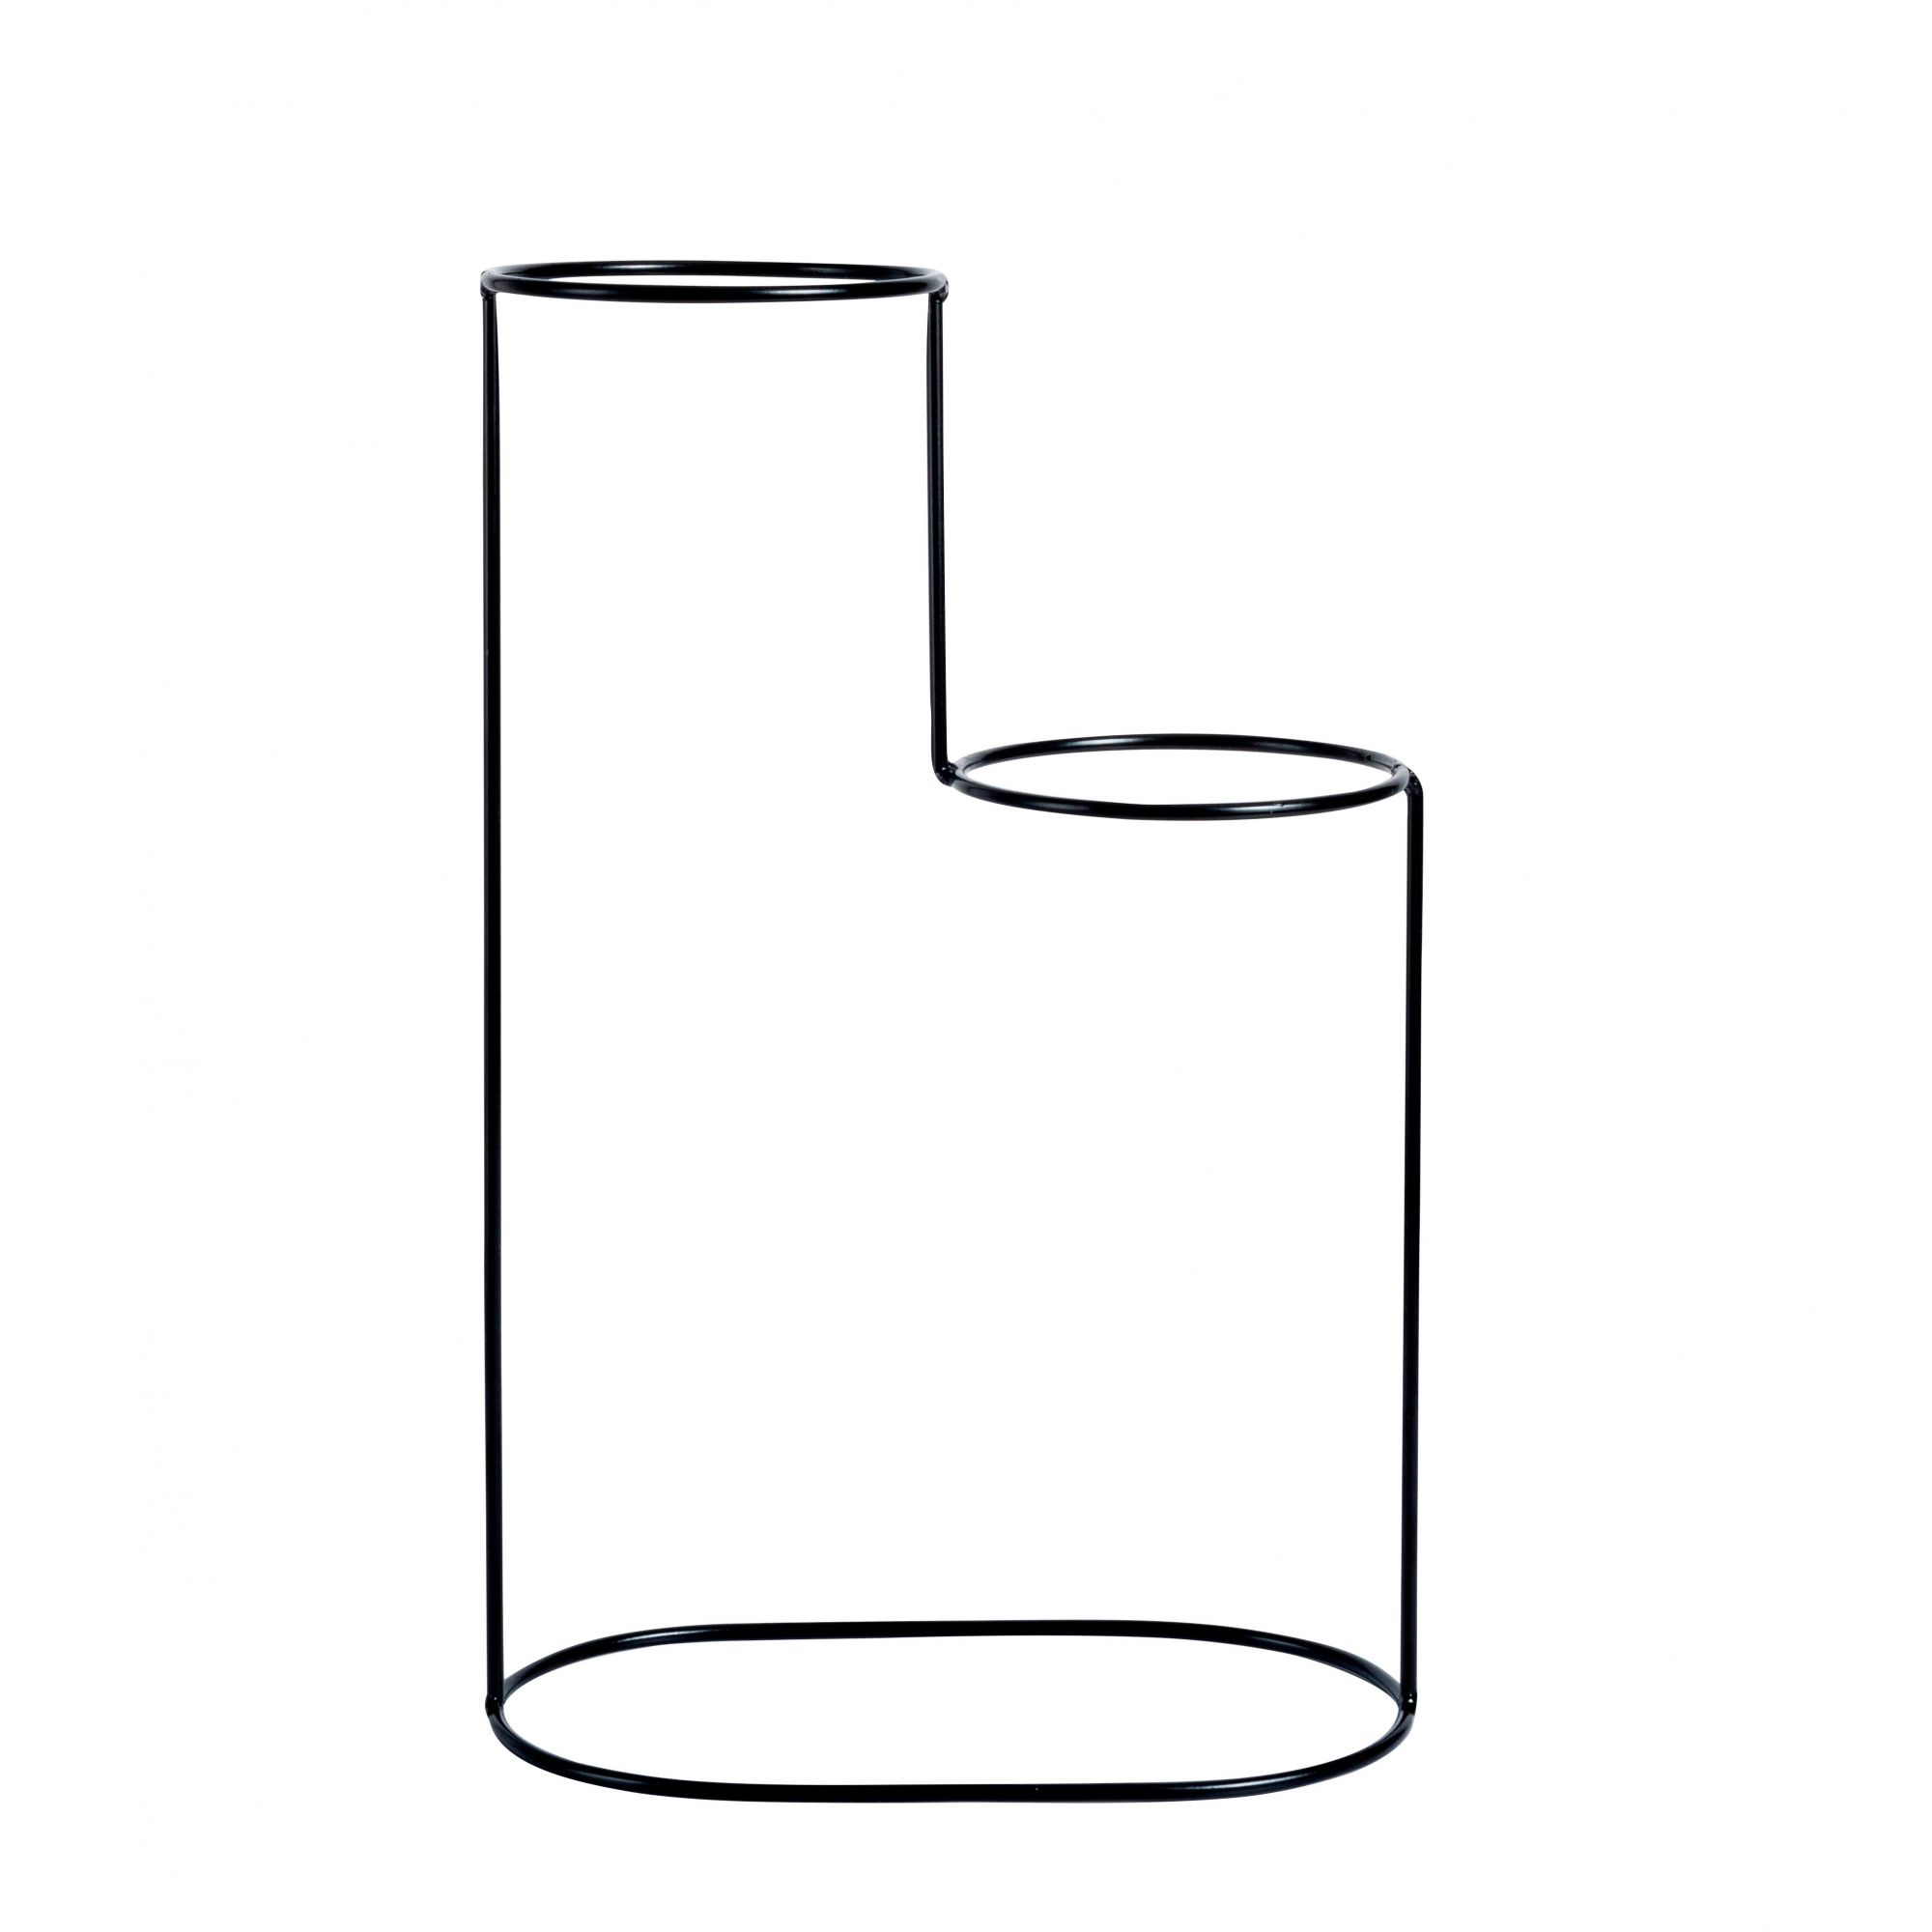 Suporte Aramado Cascata Preto 40cm para 02 Vasos Raiz Pequenos N02  - Vasos Raiz Loja Oficial